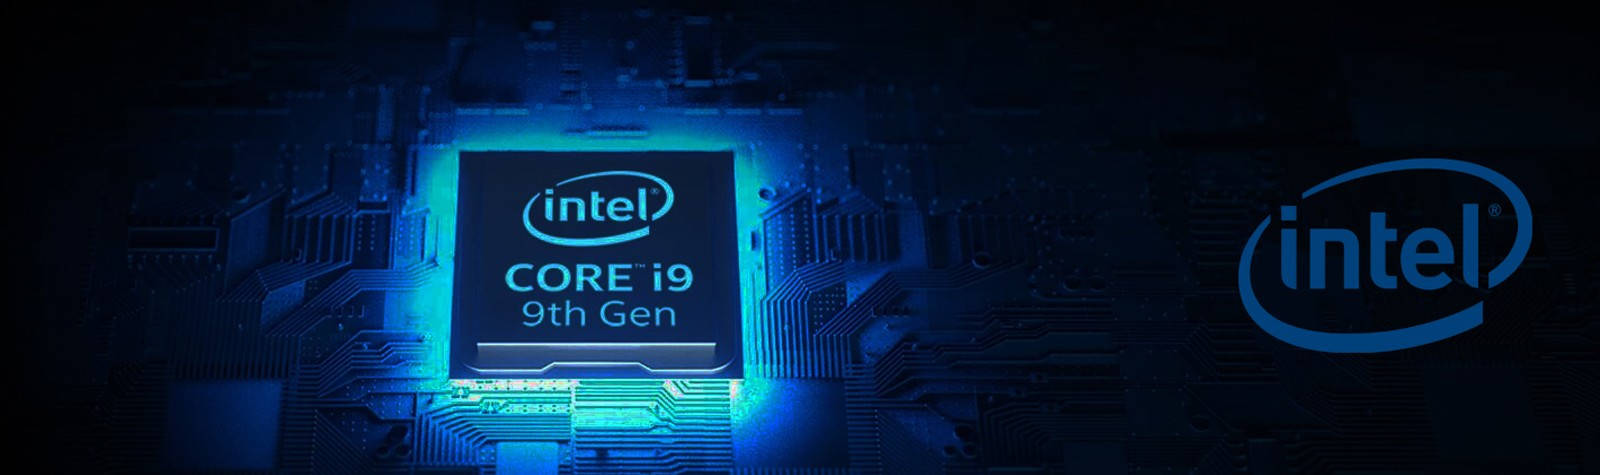 Bilen Bilgisayar Intel Provider Gold